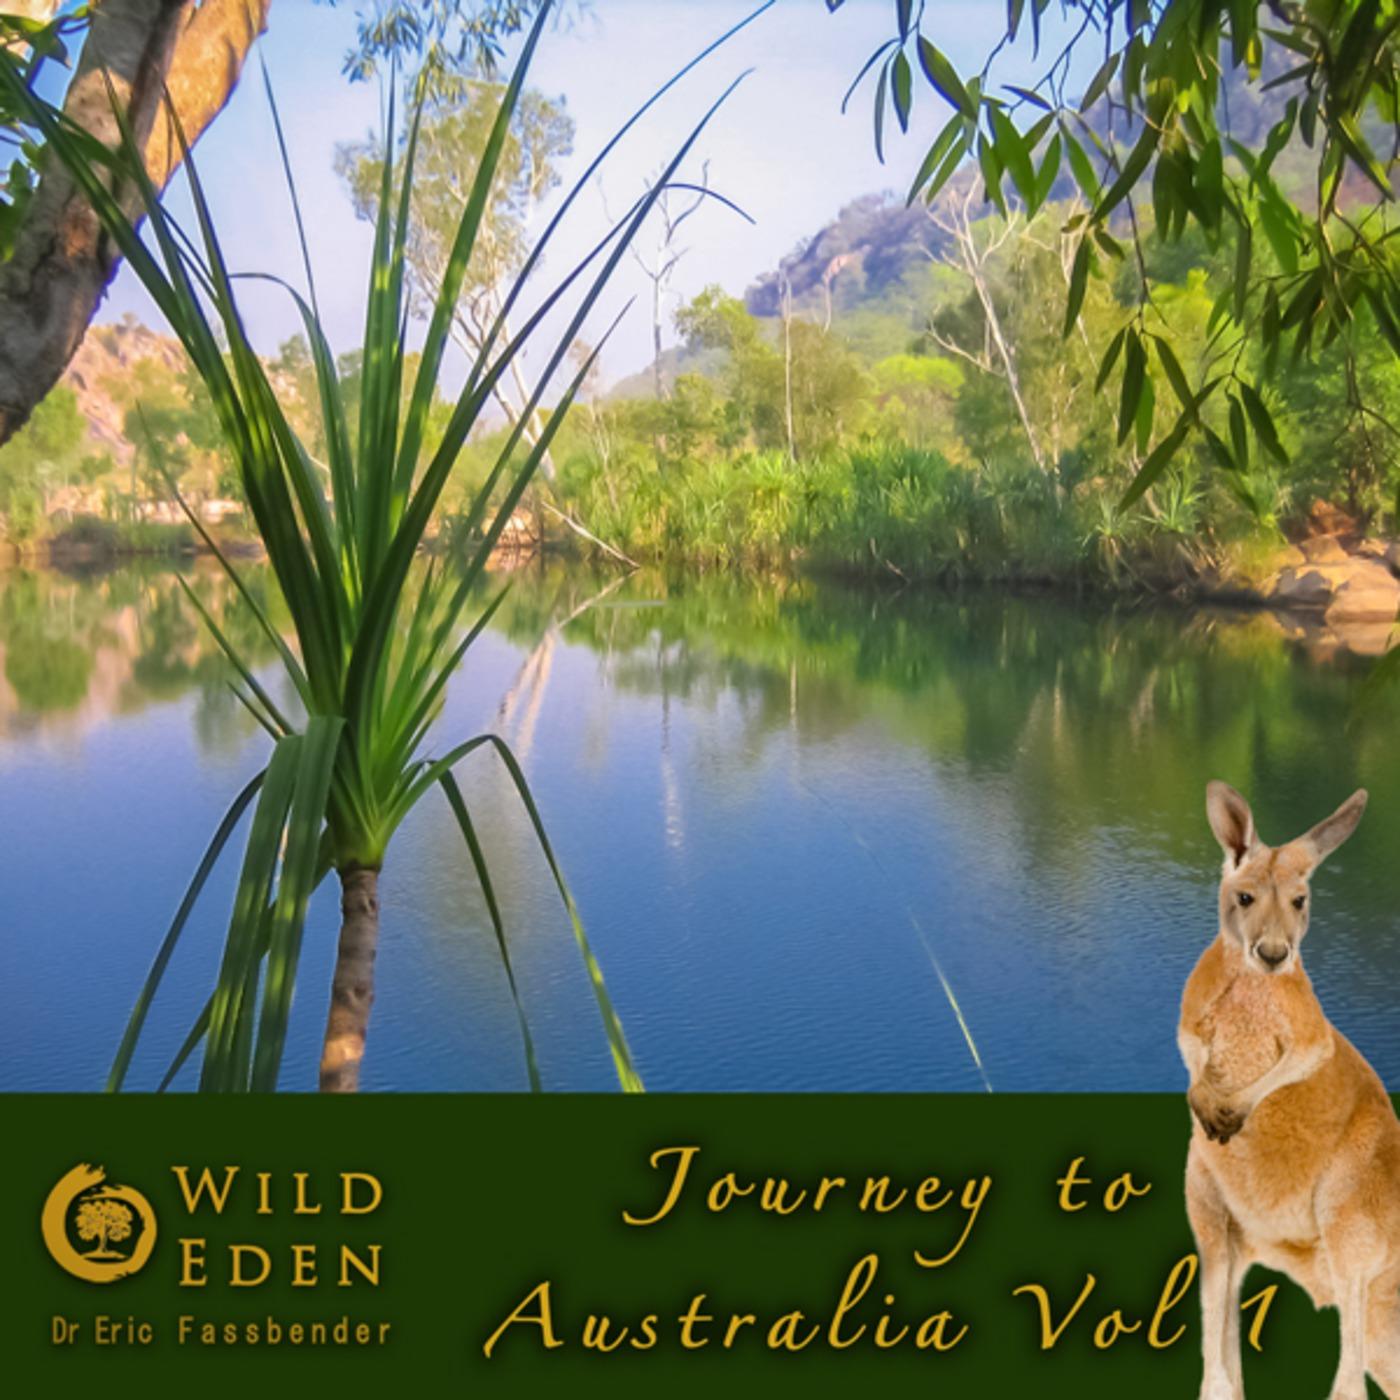 Episode 8 - Crystal Falls - Nitmiluk National Park - Track 6 - Album - Journey to Australia Vol.1